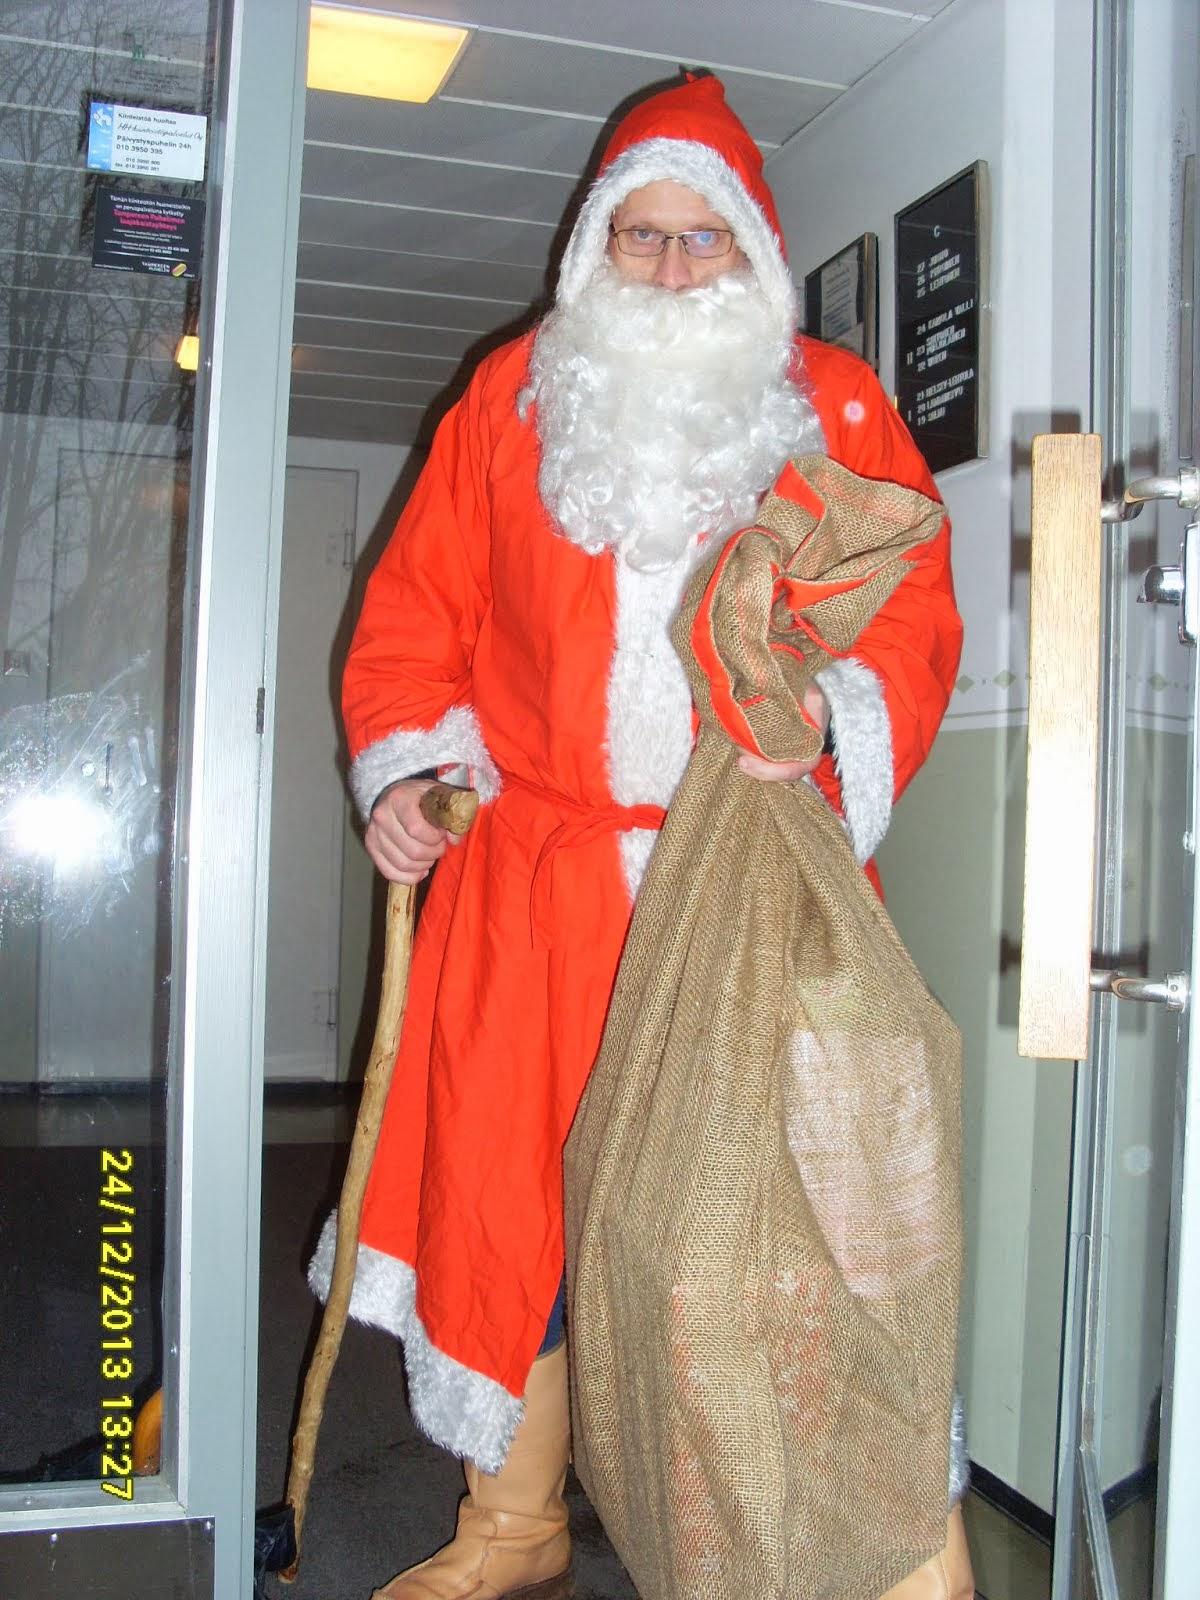 Tampereen Joulupukki e-mail: joulupukkipalvelu@gmail.com